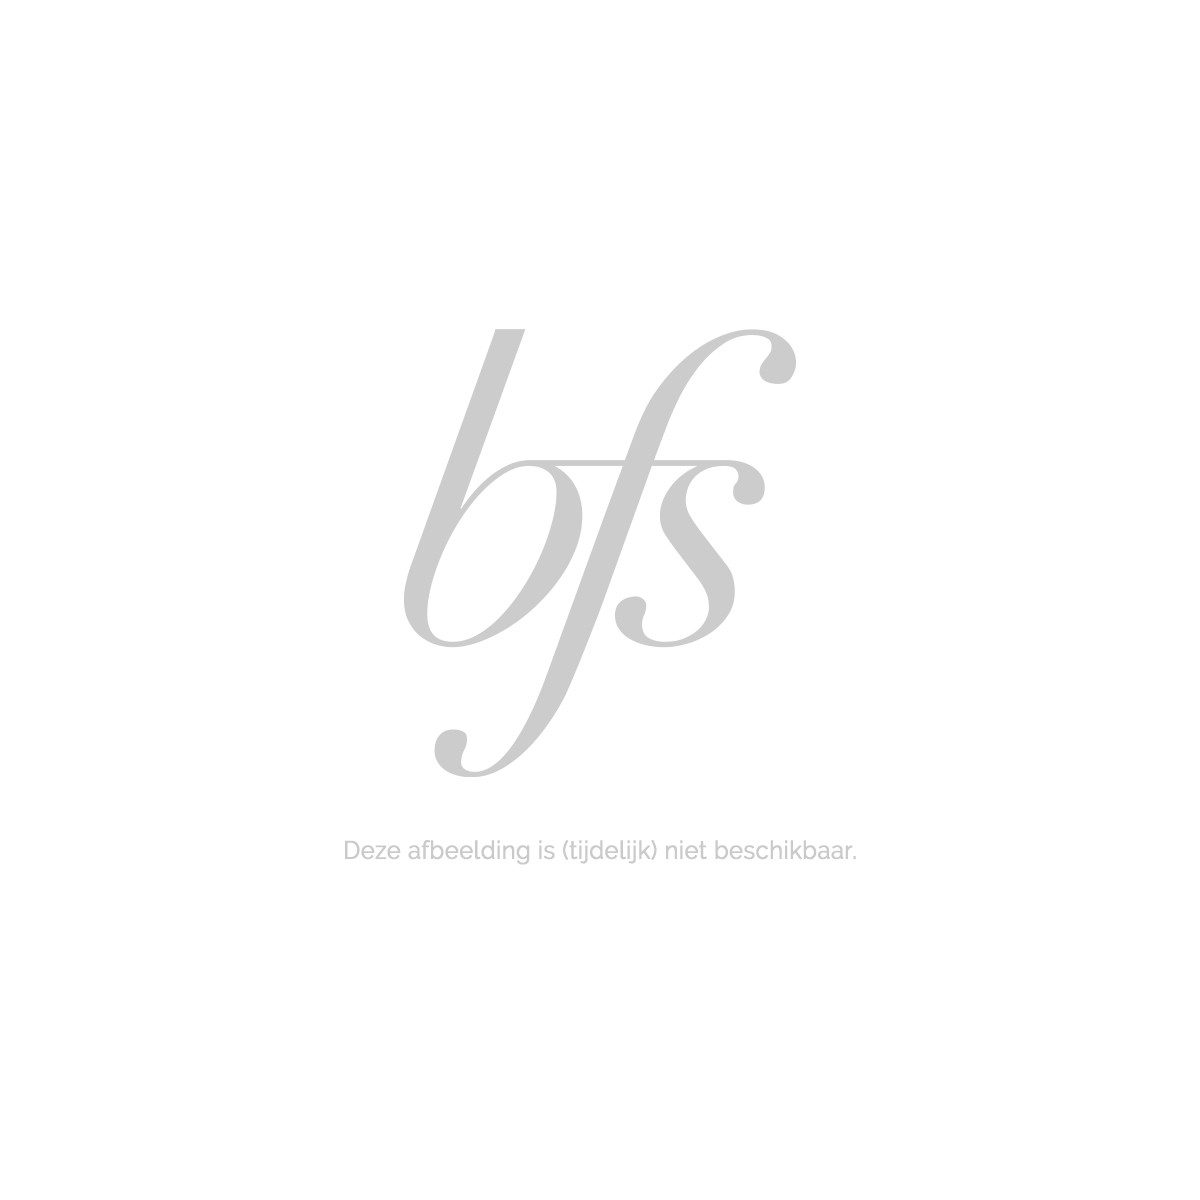 Biosilk Hydrating Therapy Conditioner-15 Ml